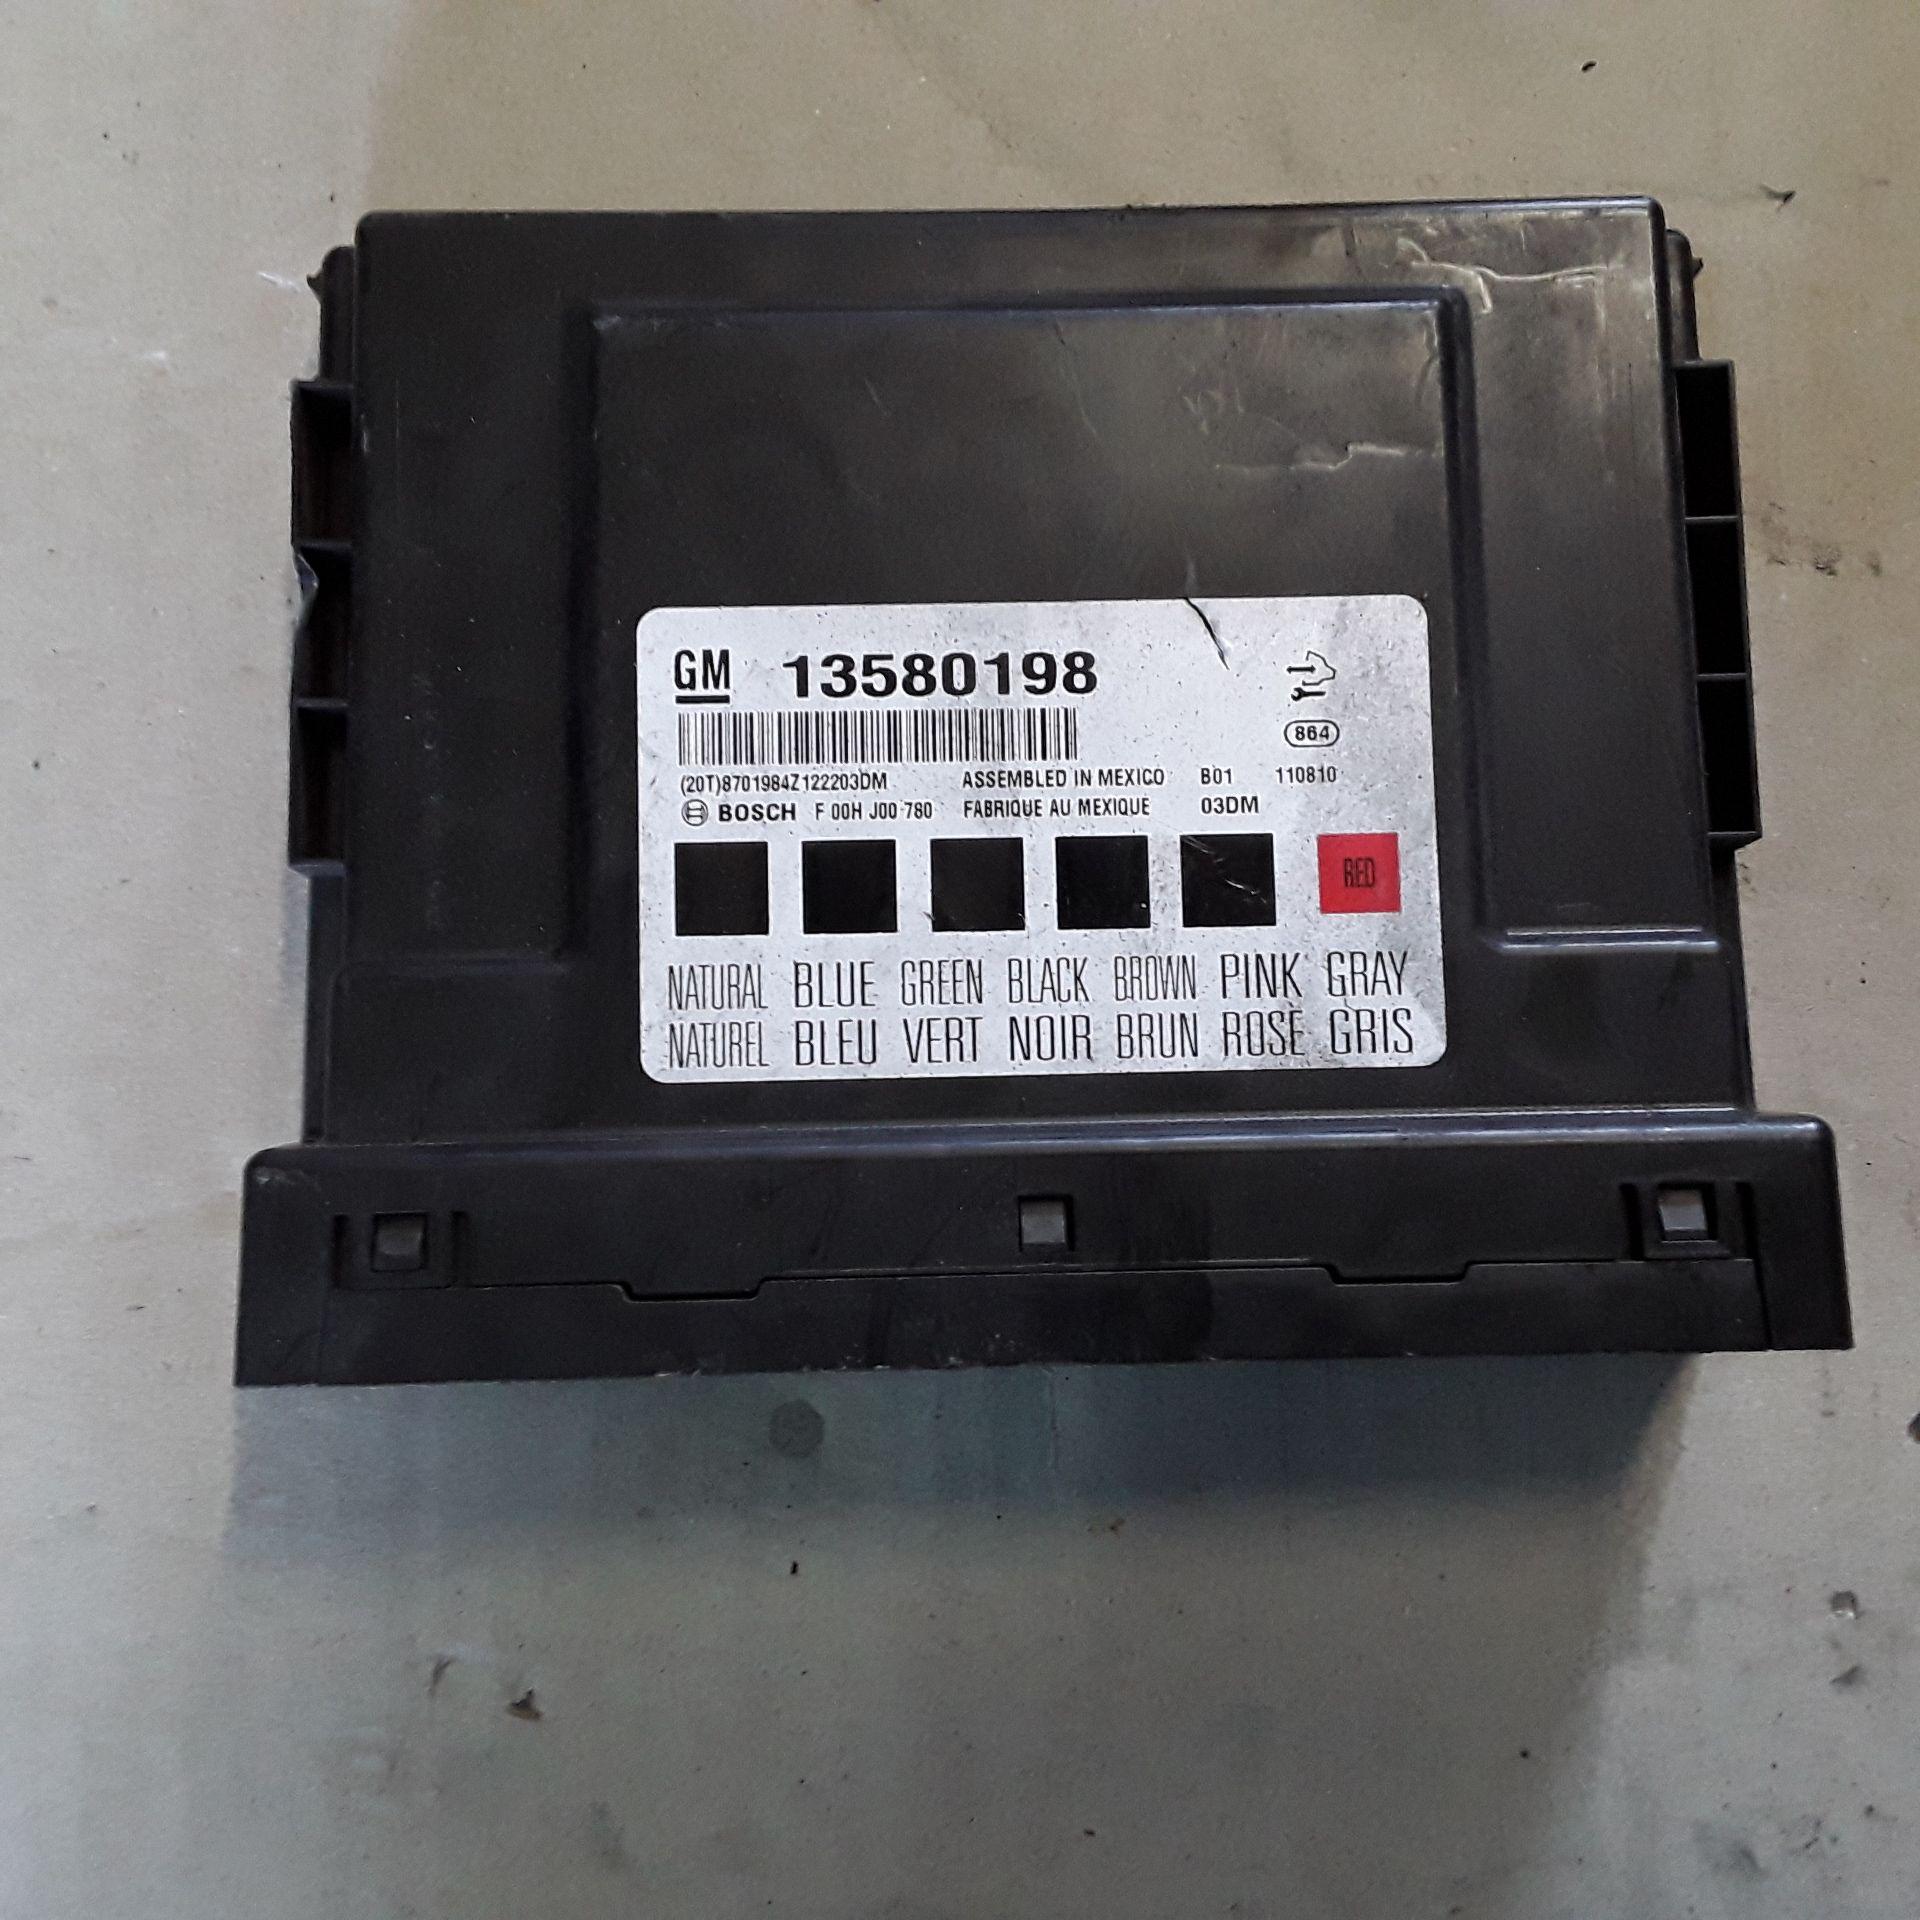 13580198 BODY COMPUTER OPEL Insignia S. Wagon 2000 Diesel    (2010) RICAMBI USATI